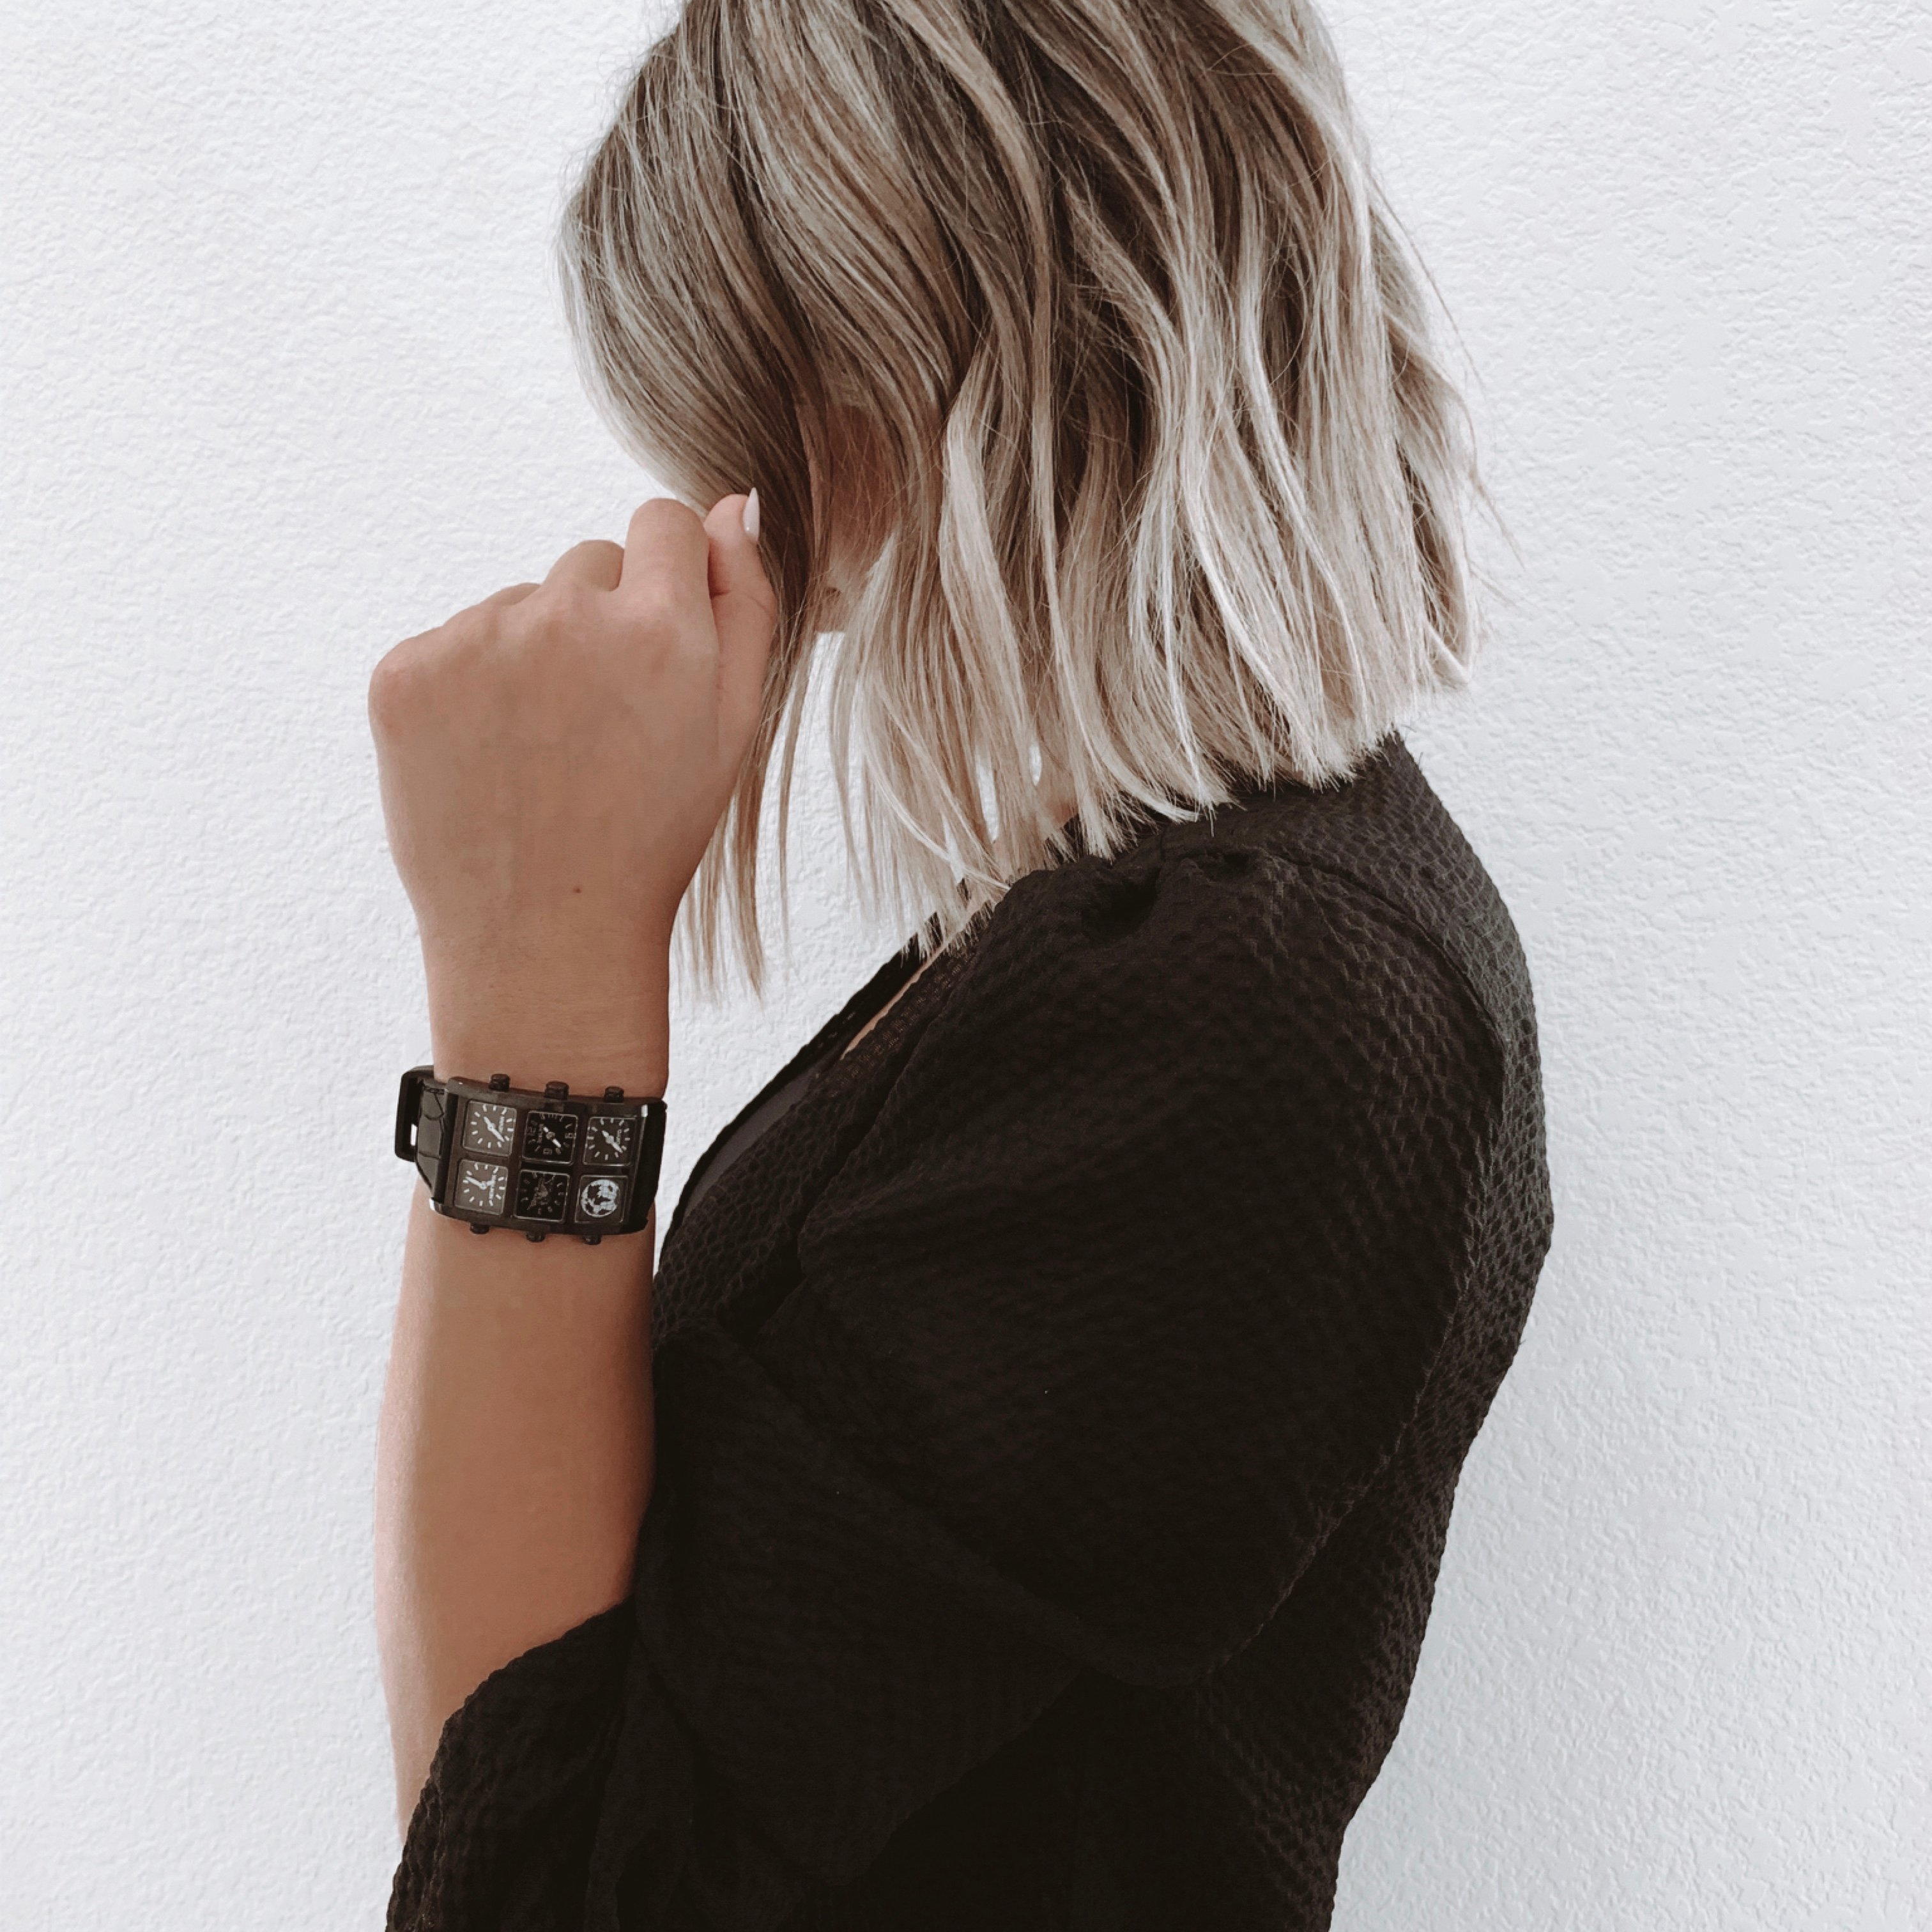 Woman wearing Sable Metal 40mm Multi-Time Zone Watch - IceLink